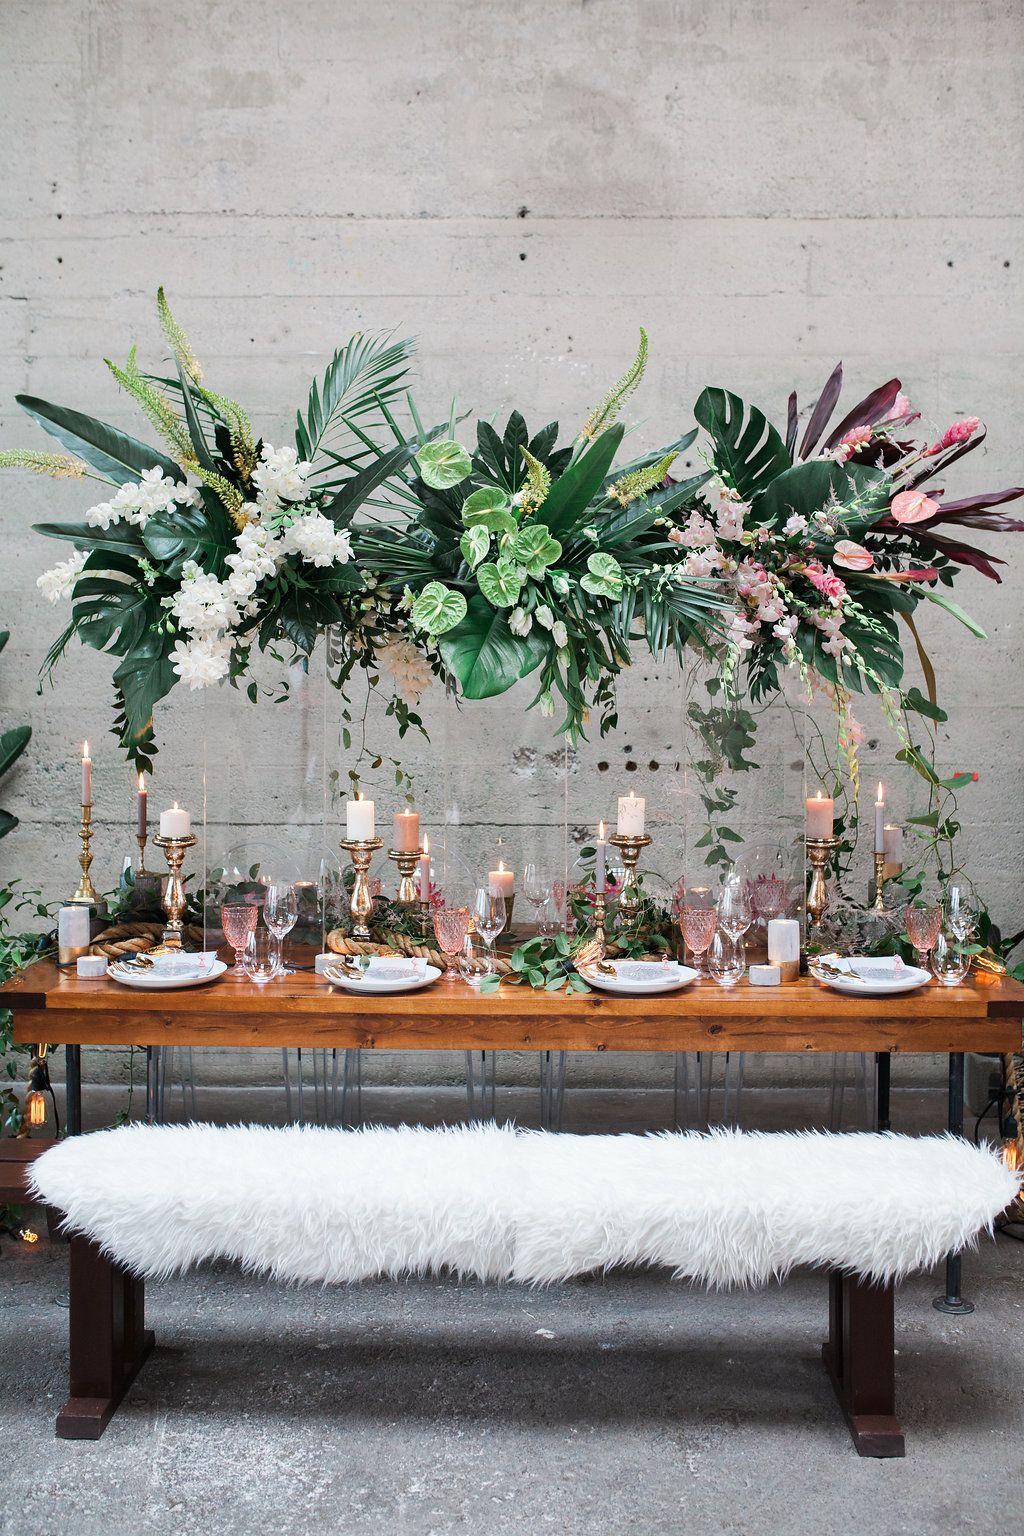 tropical wedding receptions - photo by Katt Willson http://ruffledblog.com/stylish-tropical-wedding-inspiration-in-the-pacific-northwest